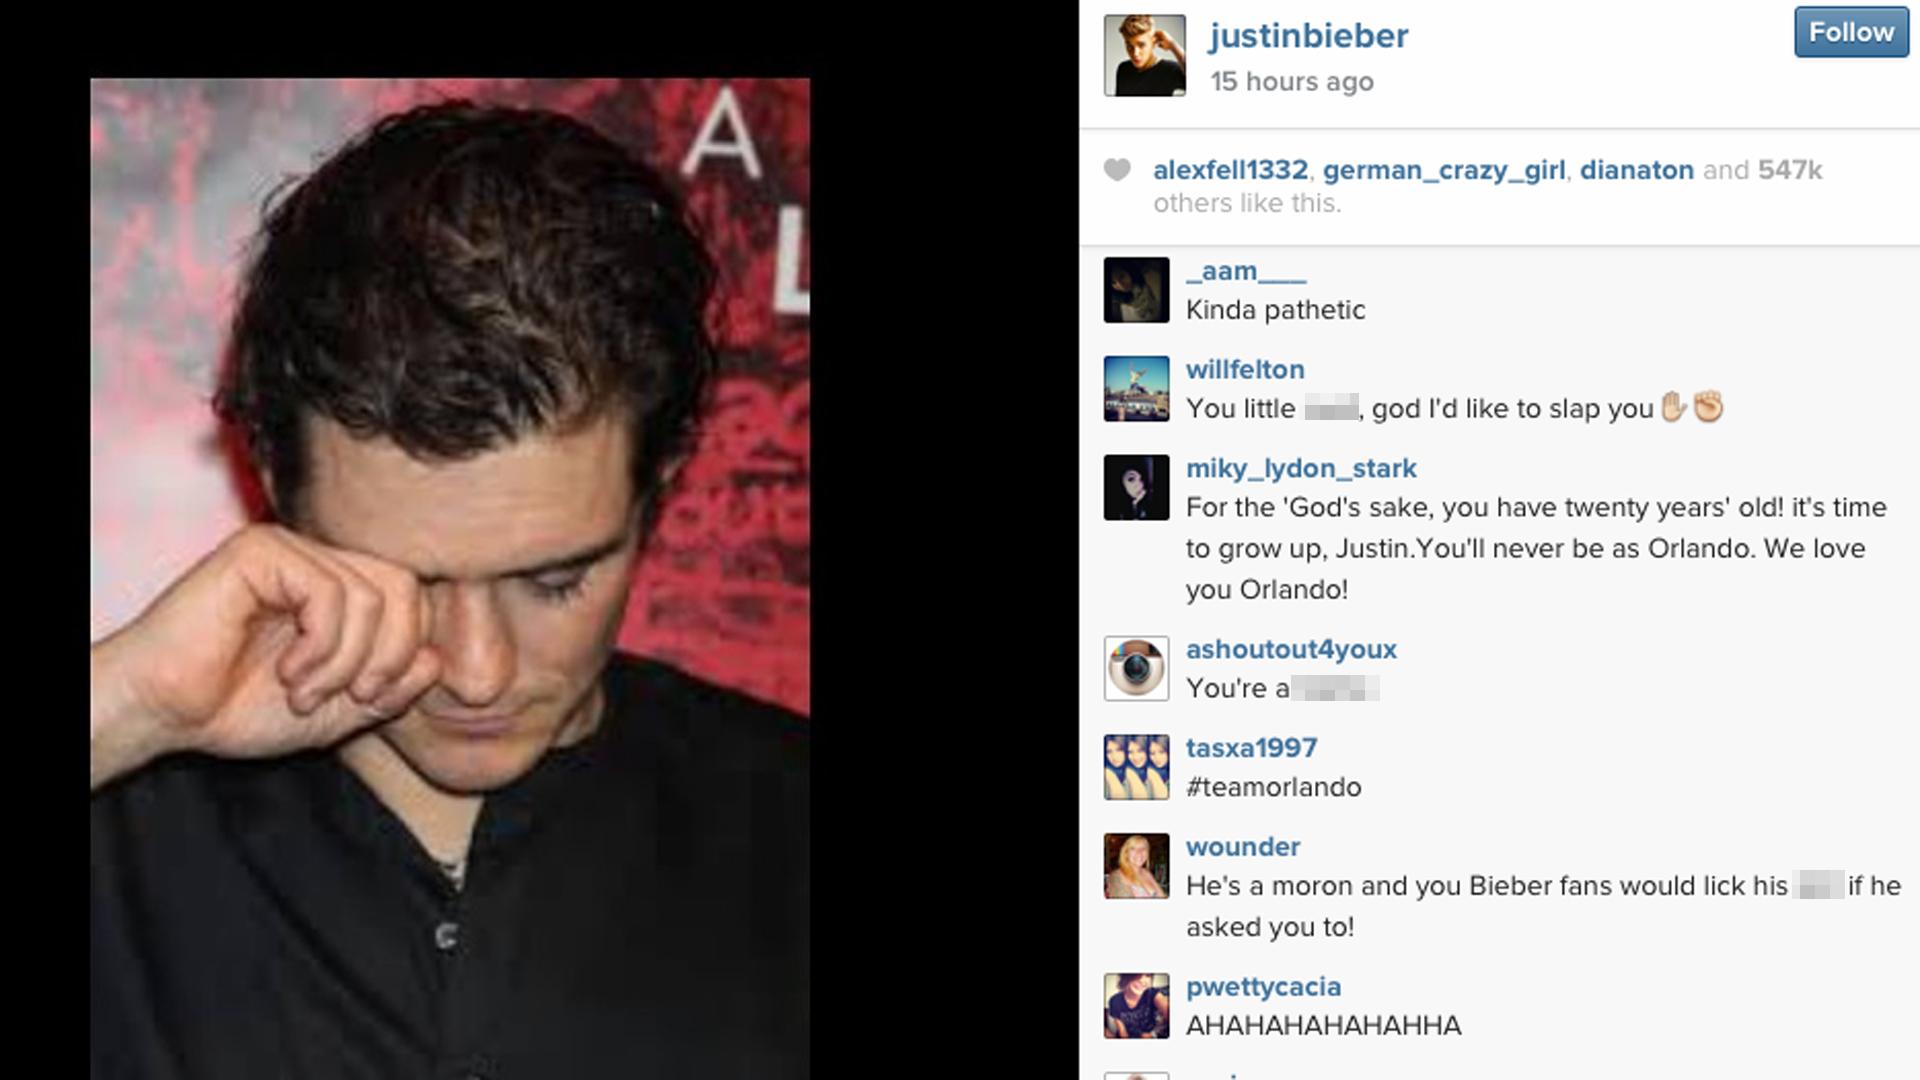 Justin Bieber's Instagram